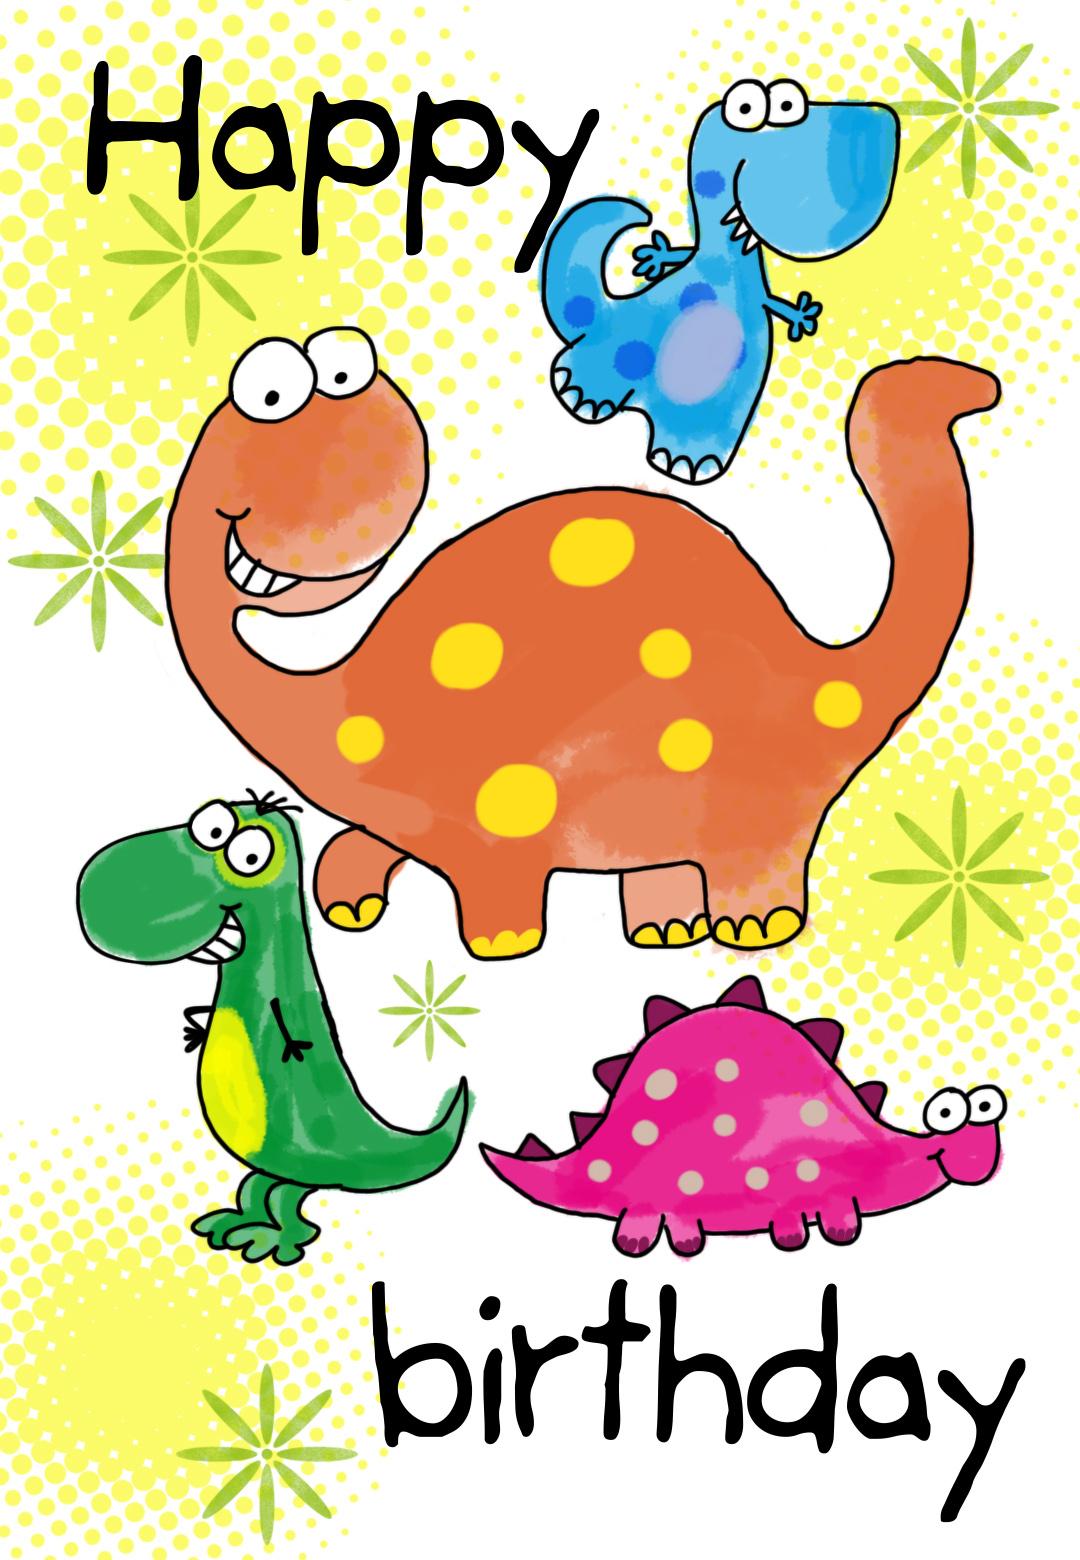 Four Cute Dinosaurs Birthday Card | Greetings Island - Free Printable Birthday Cards For Kids